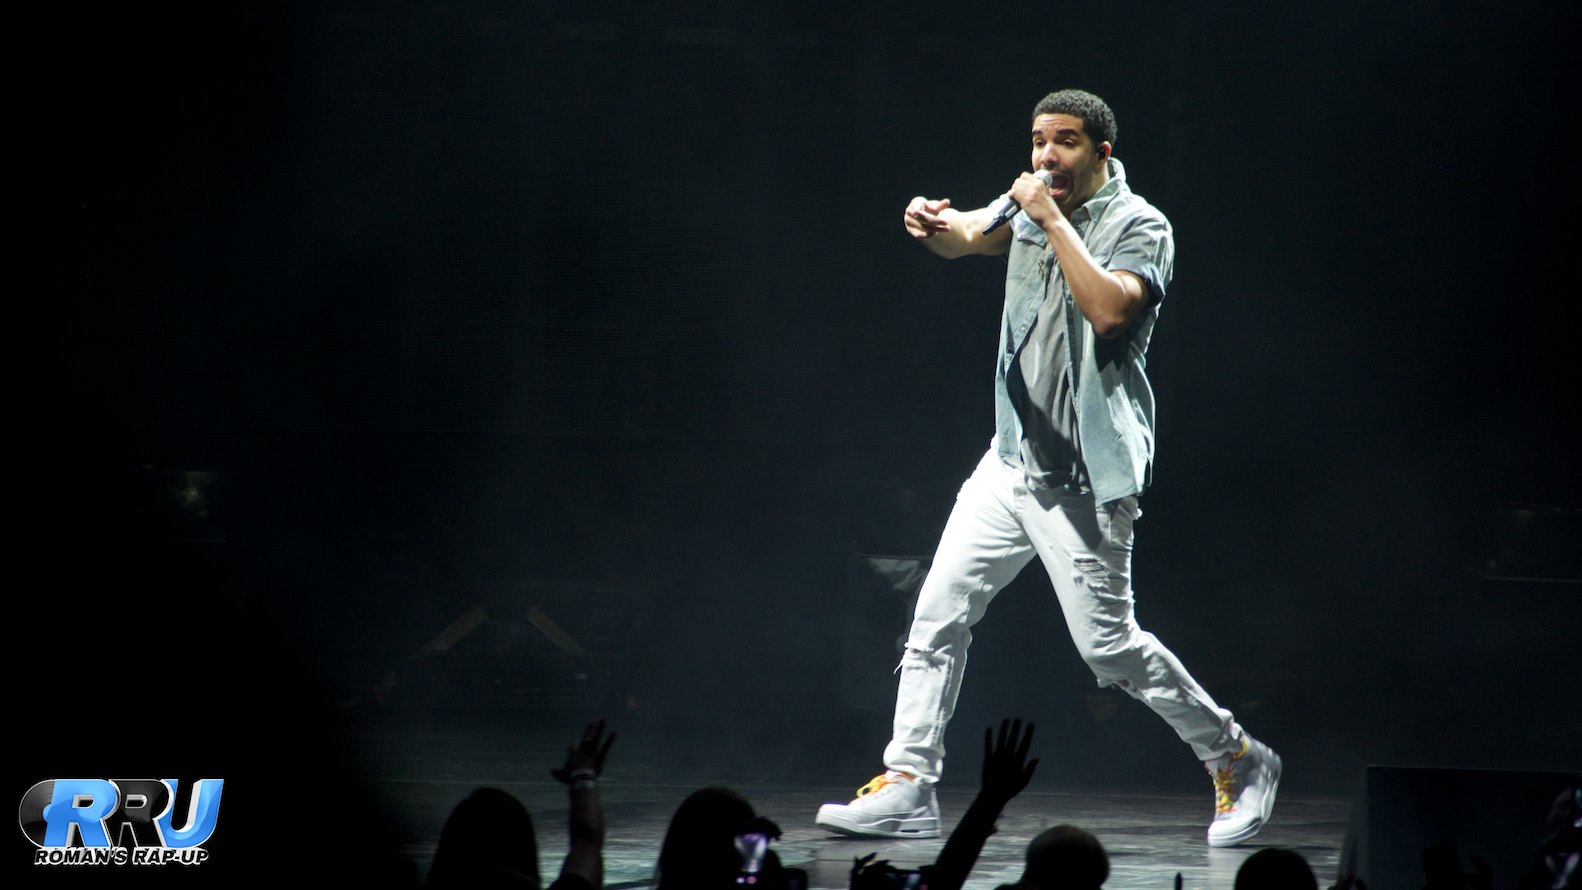 Drake Vs. Lil Wayne 32.jpg